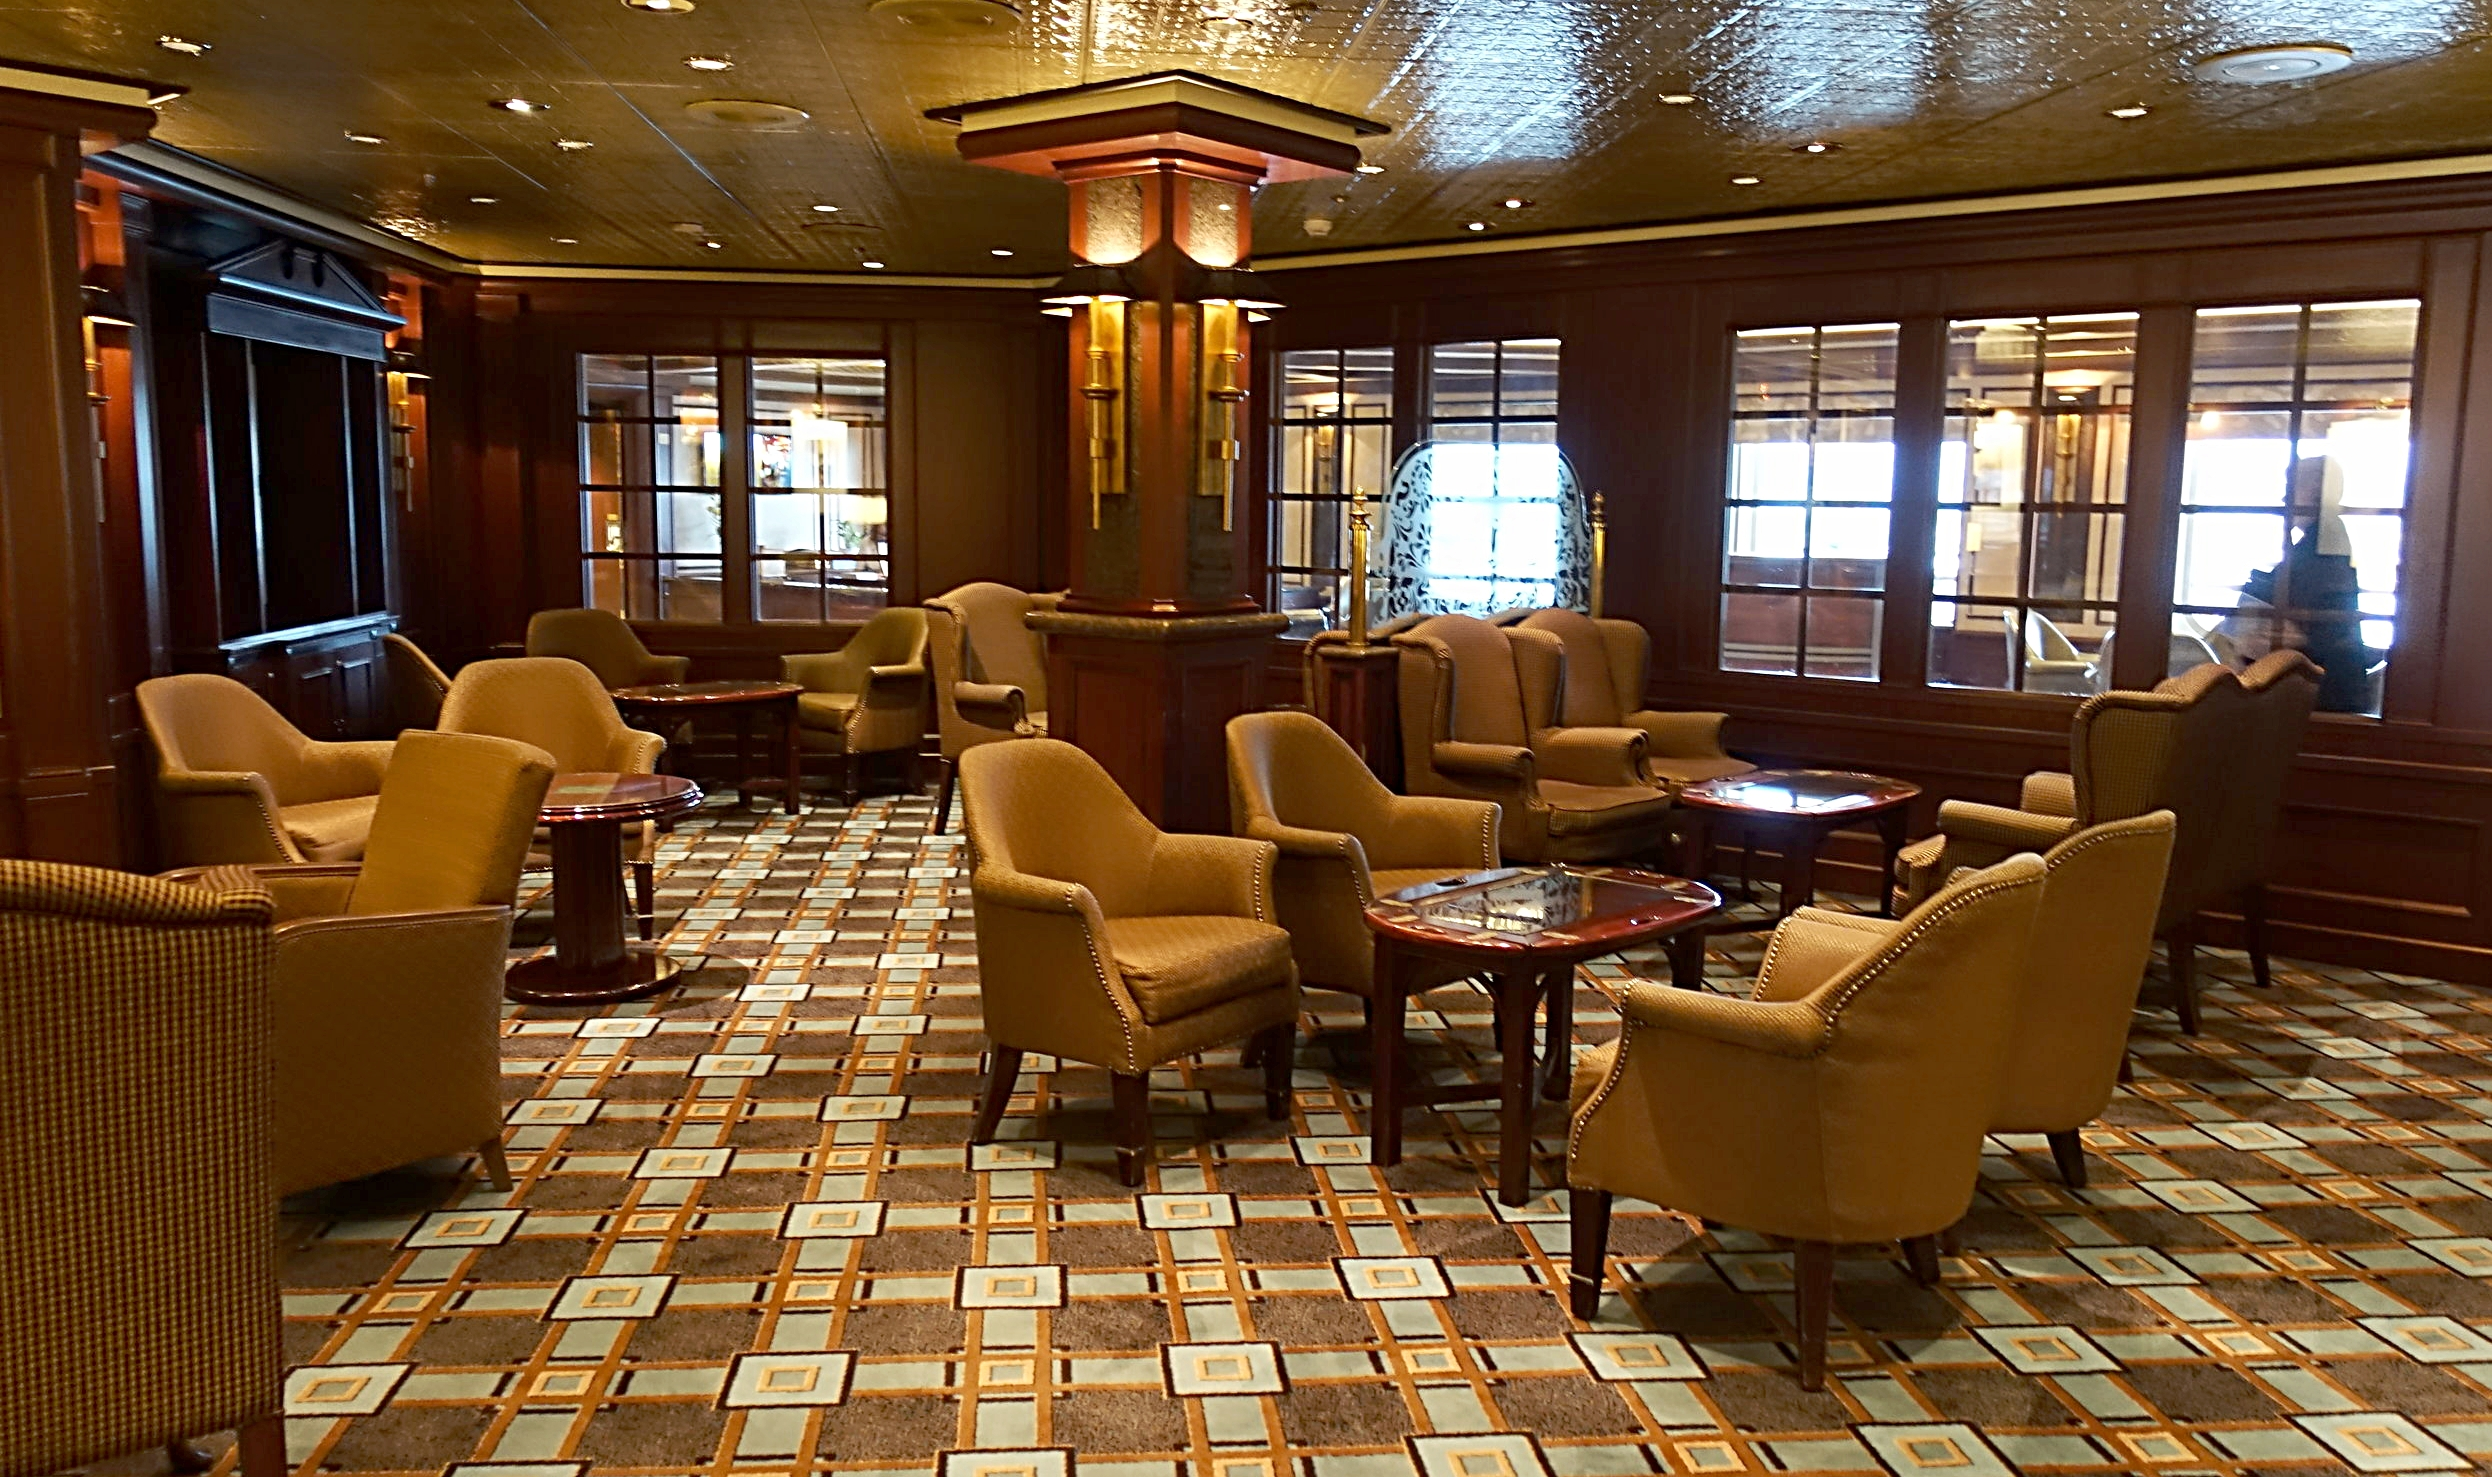 The Wheelhouse bar, perfect for enjoying a pint.